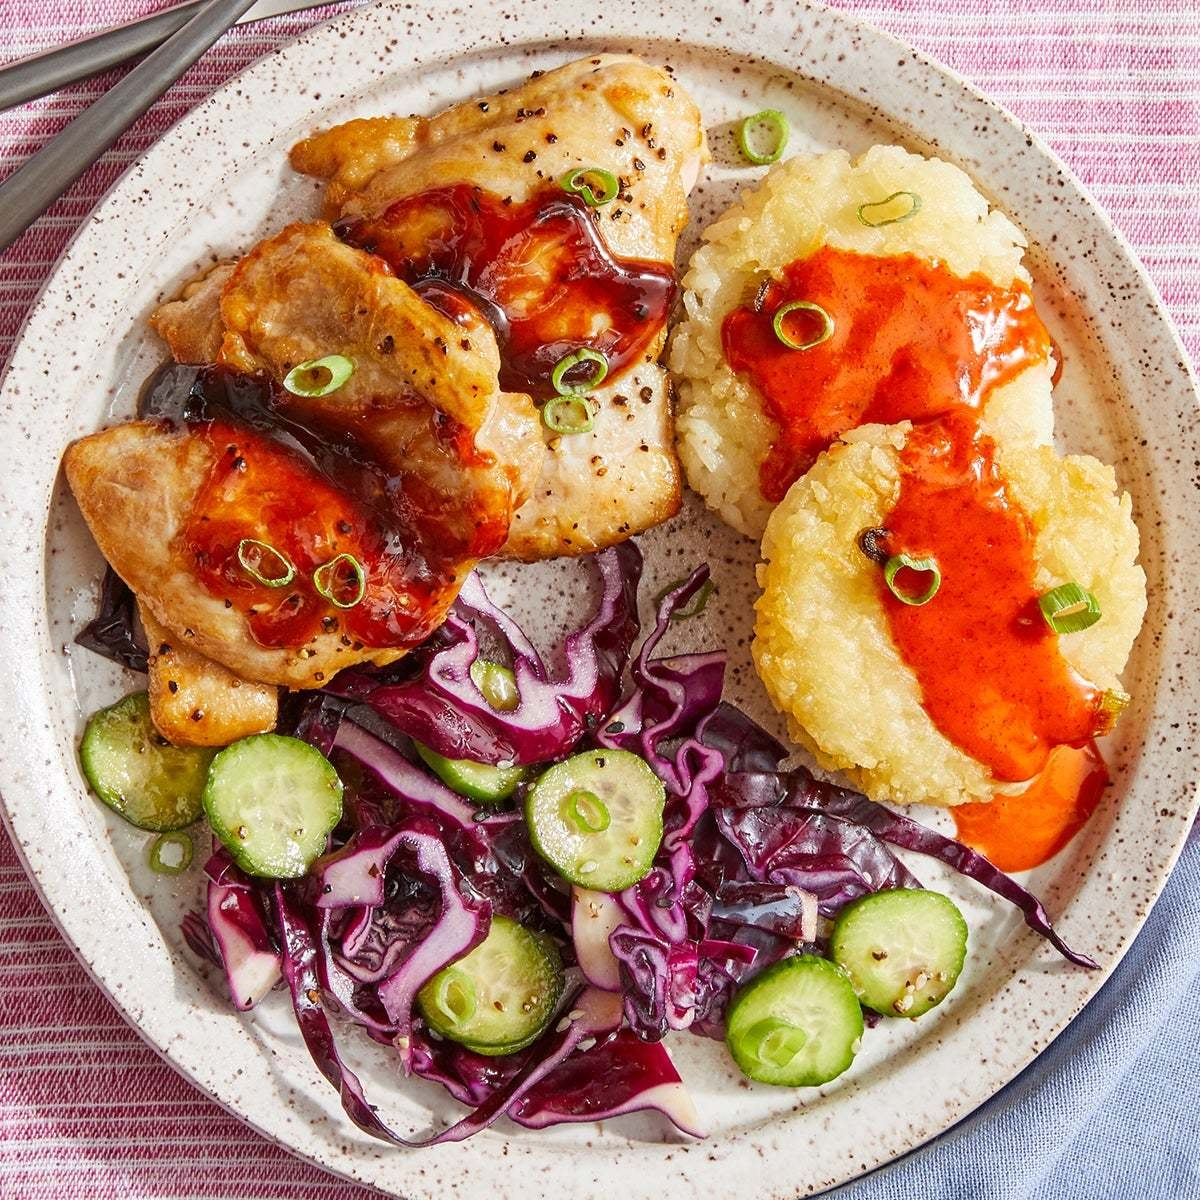 Hoisin & Honey-Glazed Chicken with Crispy Rice Cakes & Spicy Mayo